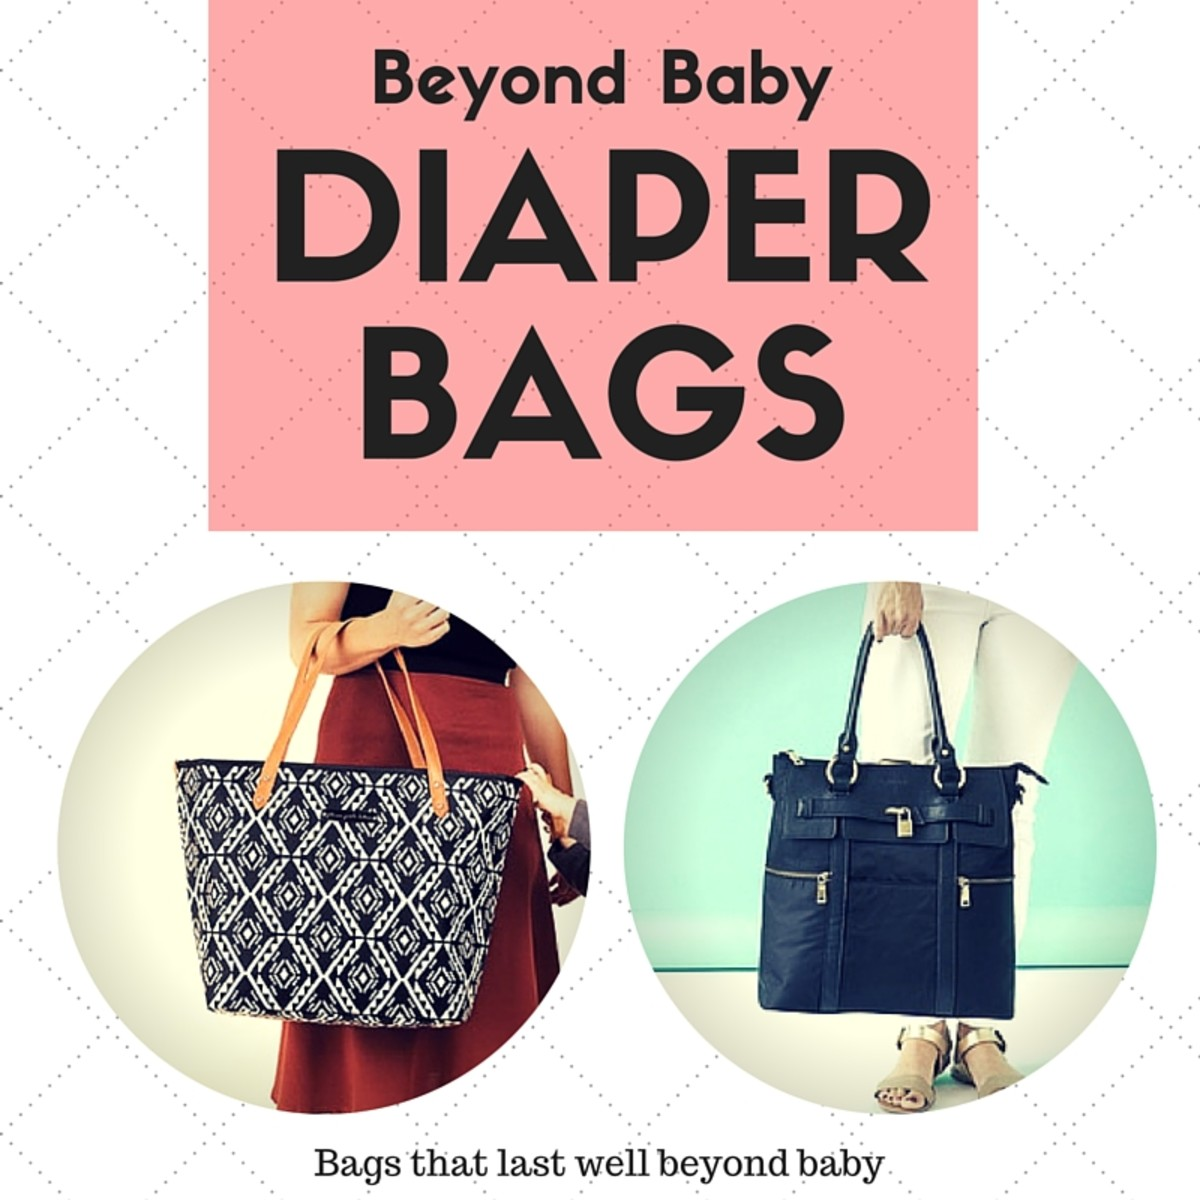 diaper bags designer cheap 56il  Beyond Baby Diaper Bags